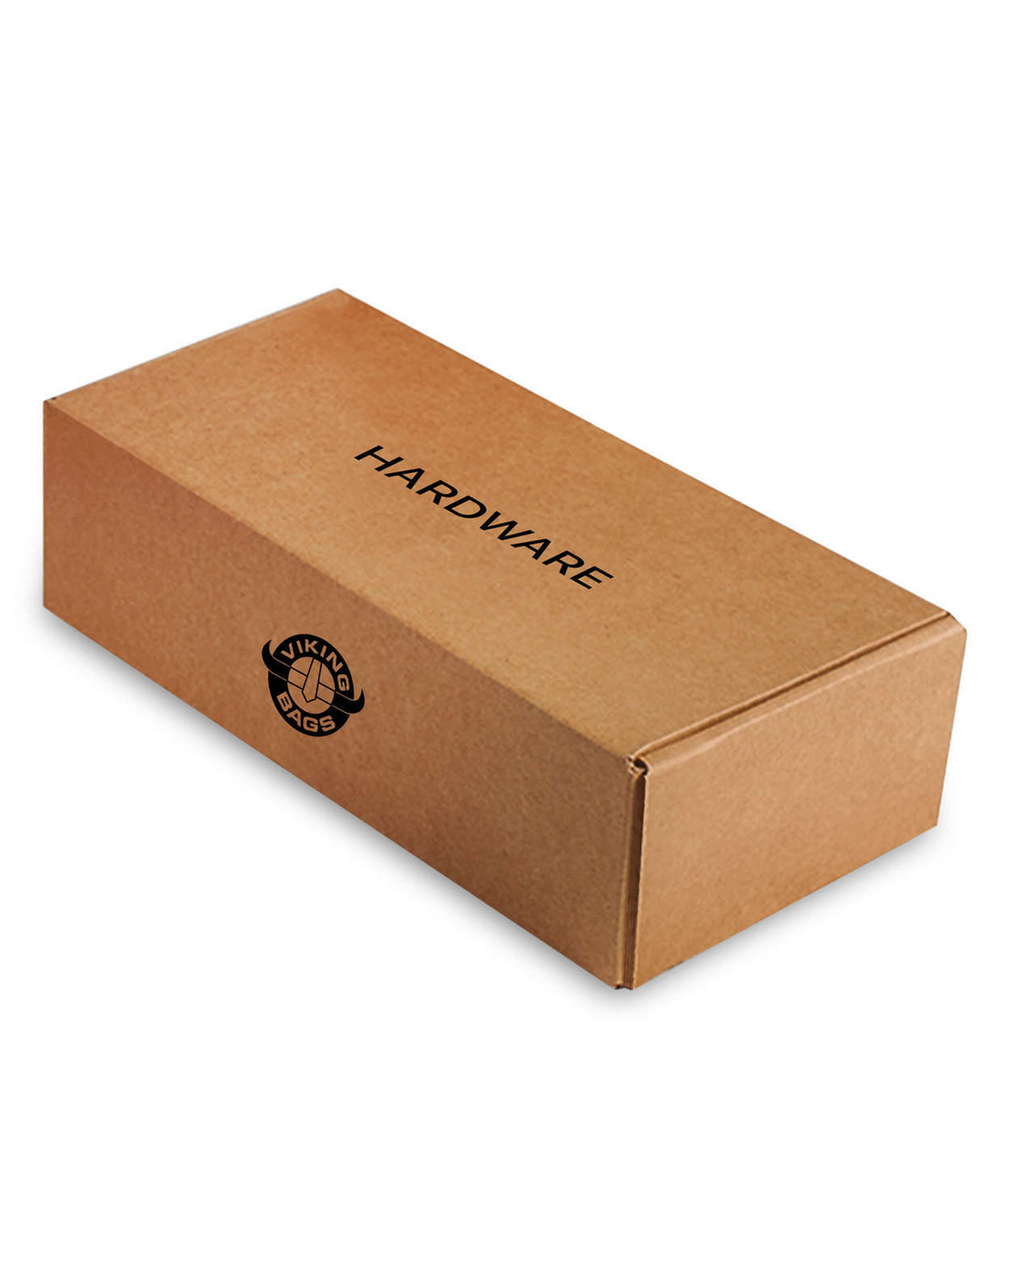 Triumph Thunderbird Thor Series Small Motorcycle Saddlebags Box